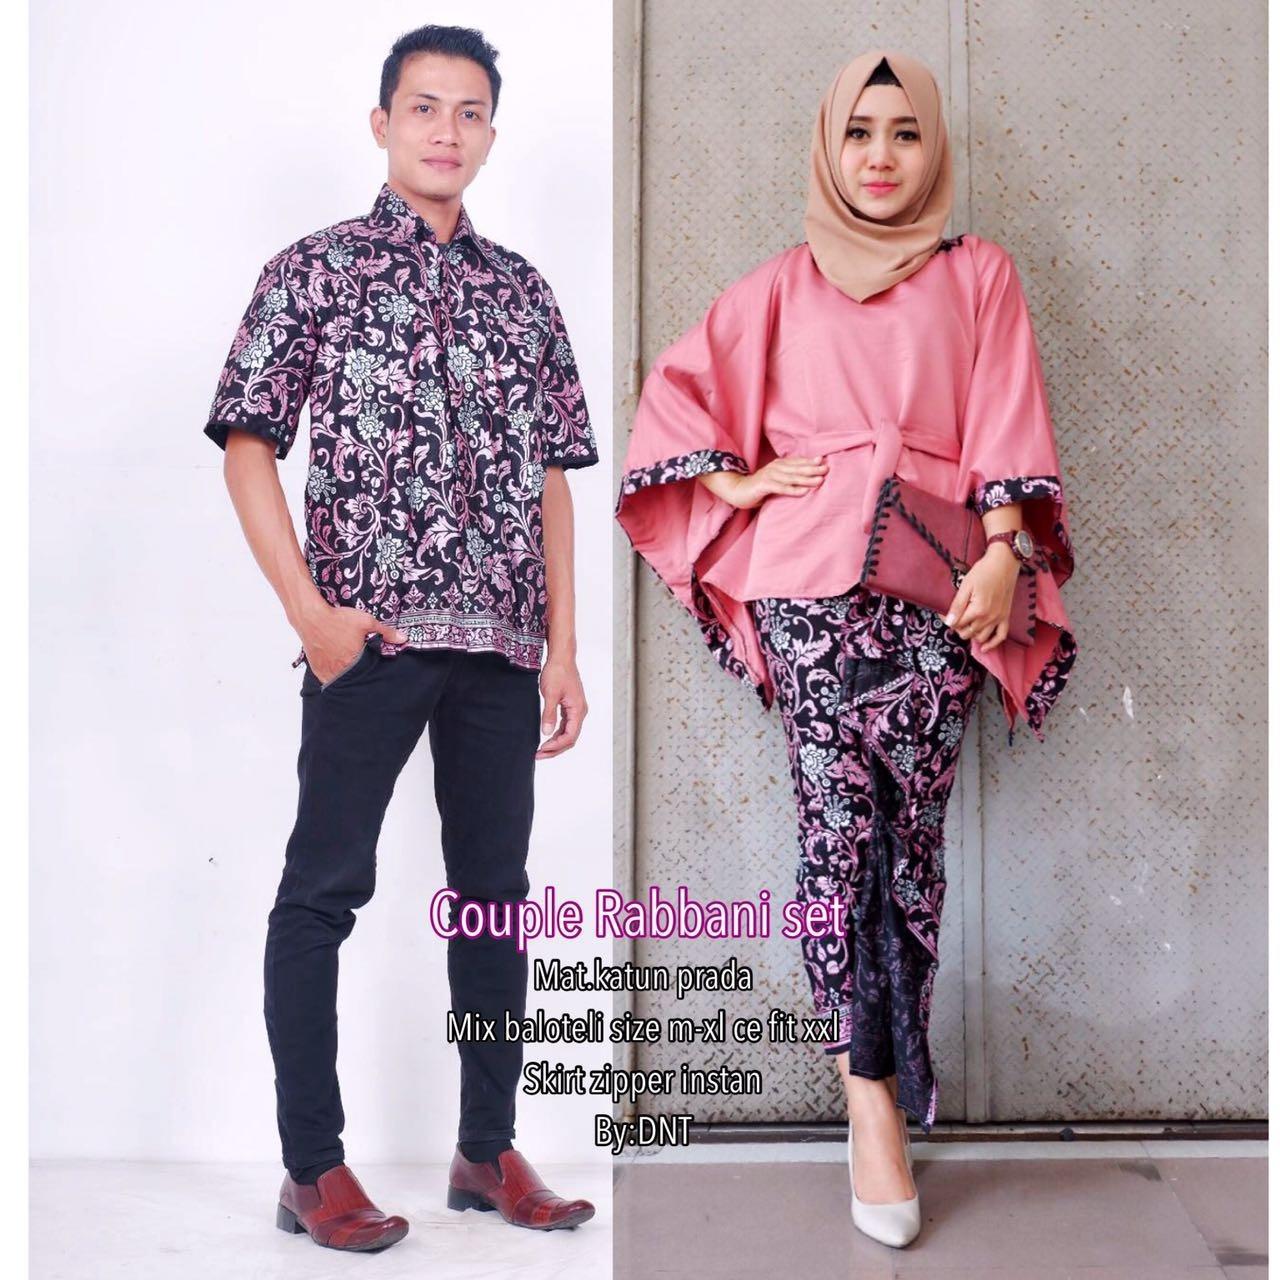 Likin_Baju batik_Baju Batik Couple_Baju Batik Sarimbit_Baju Batik Pasangan_Baju Batik Pesta_Baju Batik Keluarga_Batik Atasan_Kemeja Batik Rabbani Couple